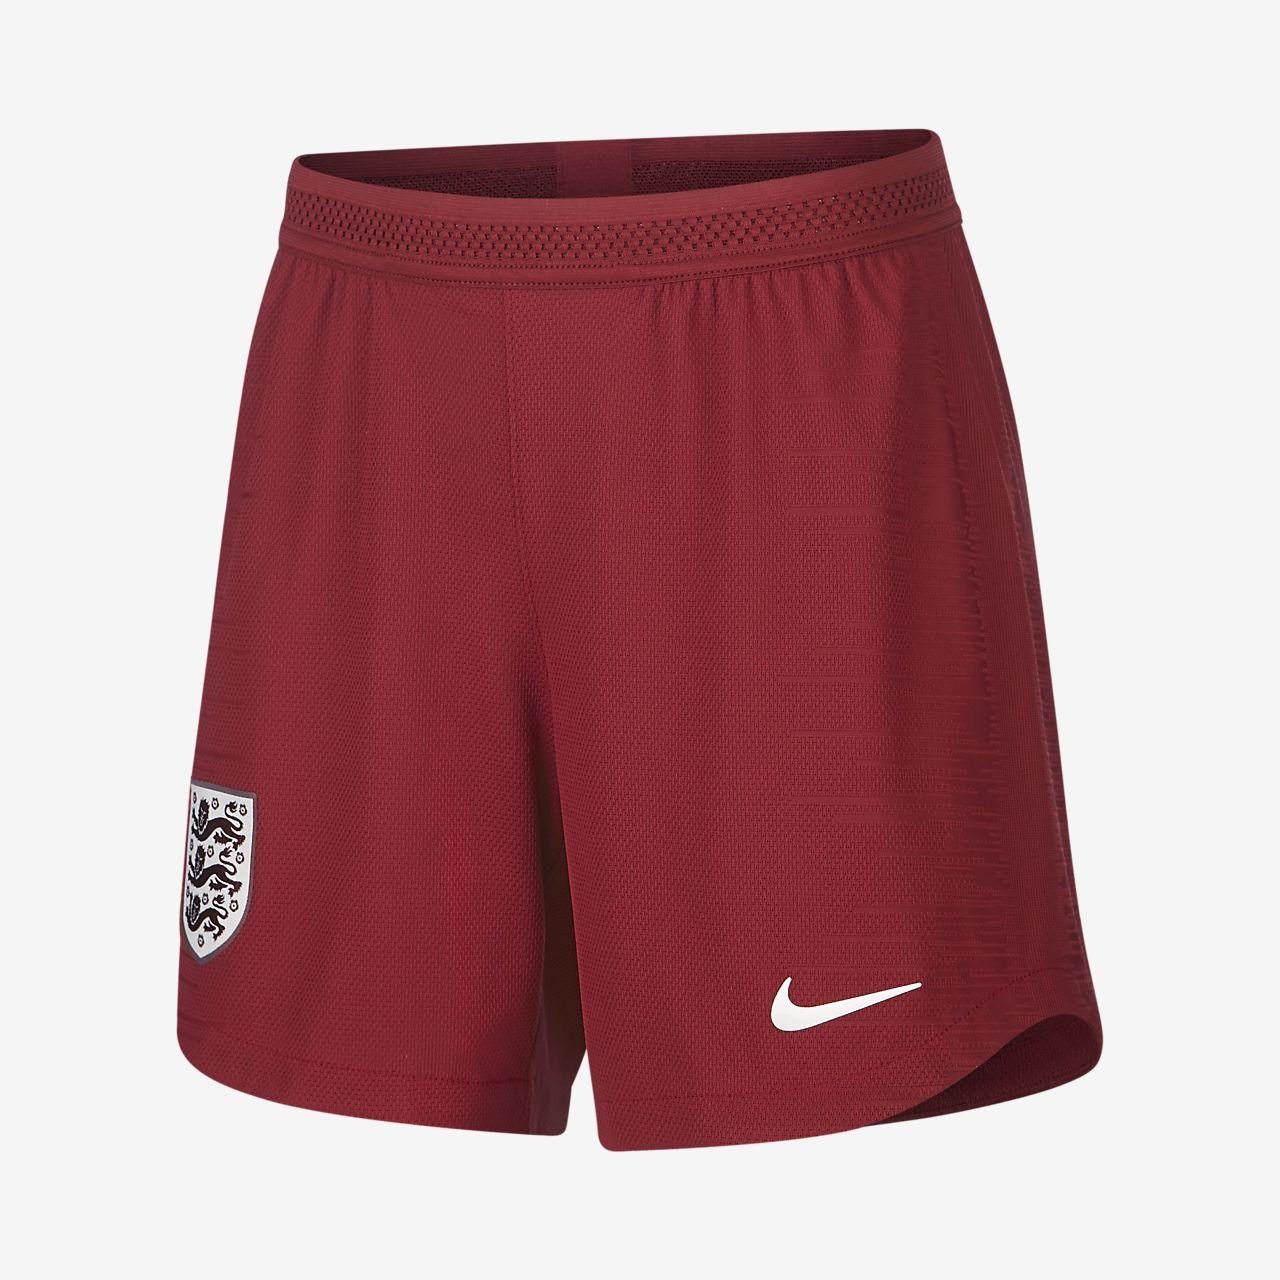 Shorts de fútbol para mujer England 2019 Vapor Match Away